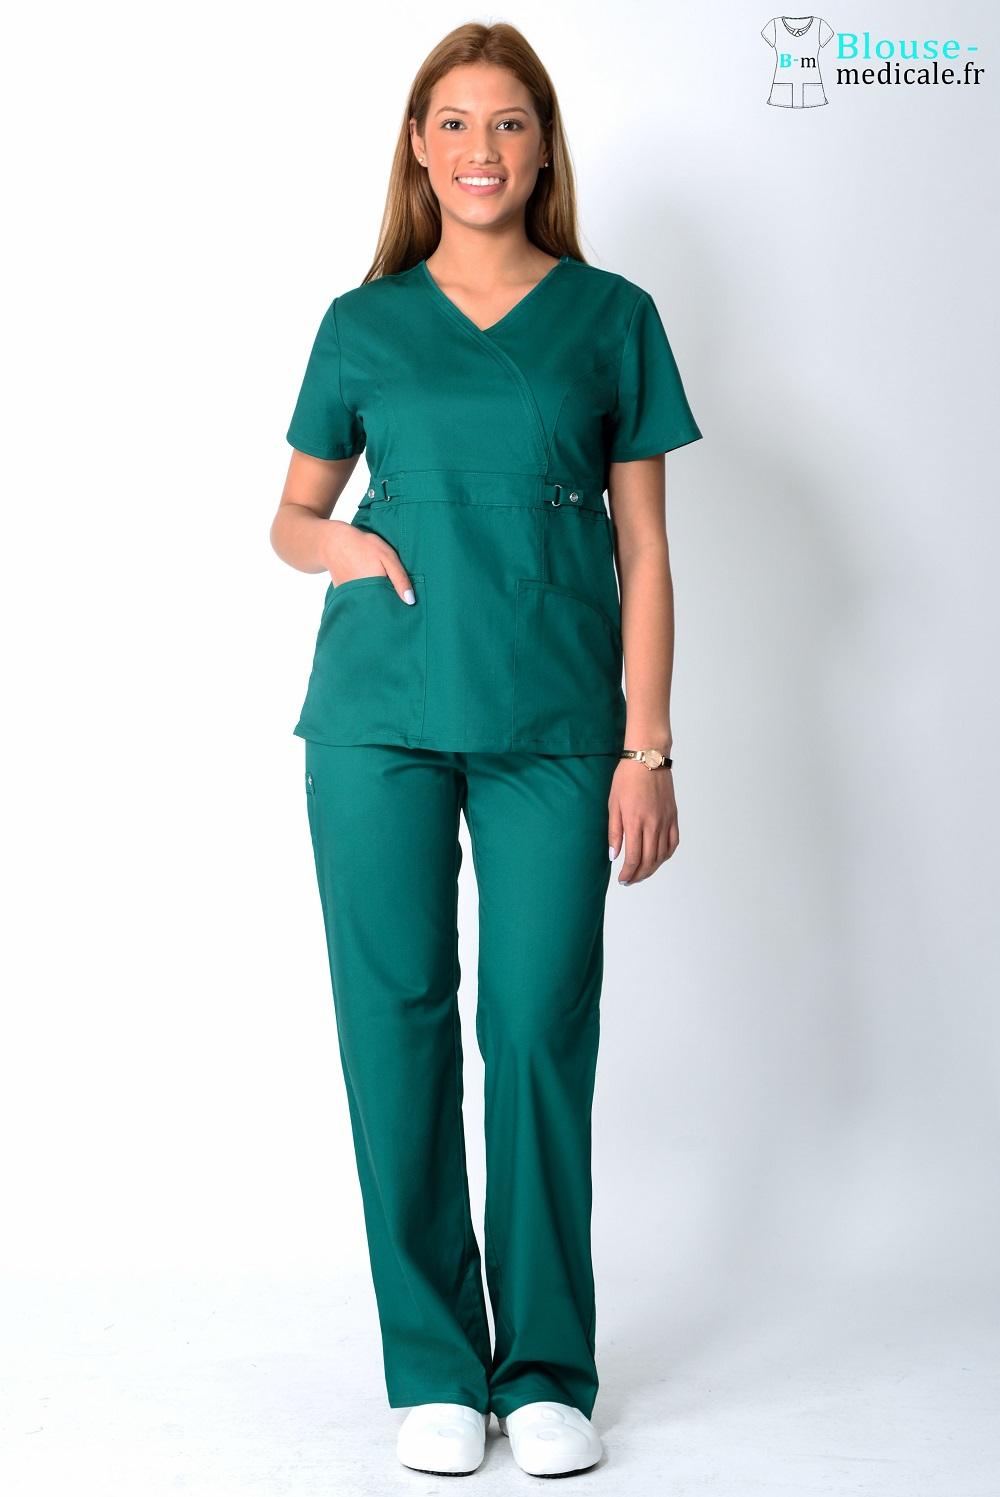 tenue médicale femme cherokee luxe tenue medicale haut de gamme infirmière